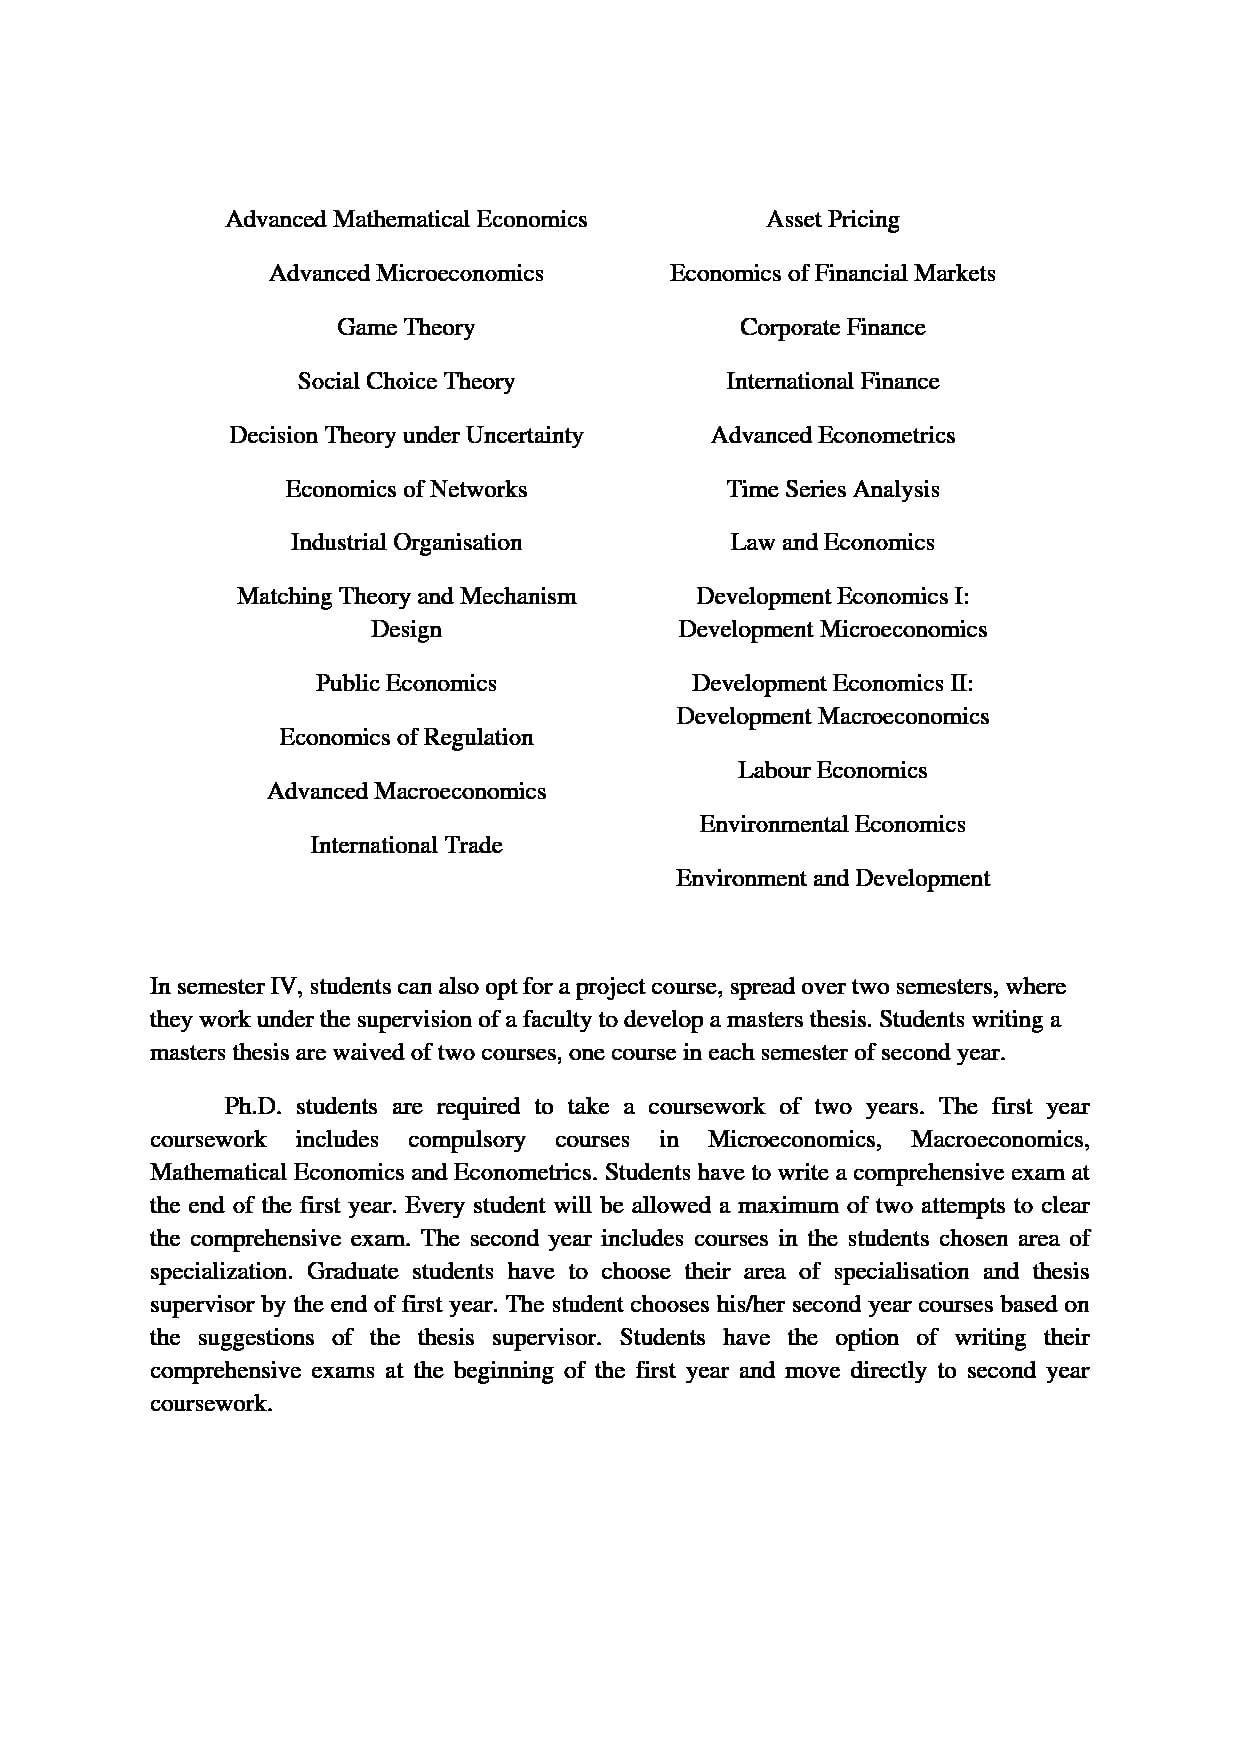 cats dog essay english pdf download